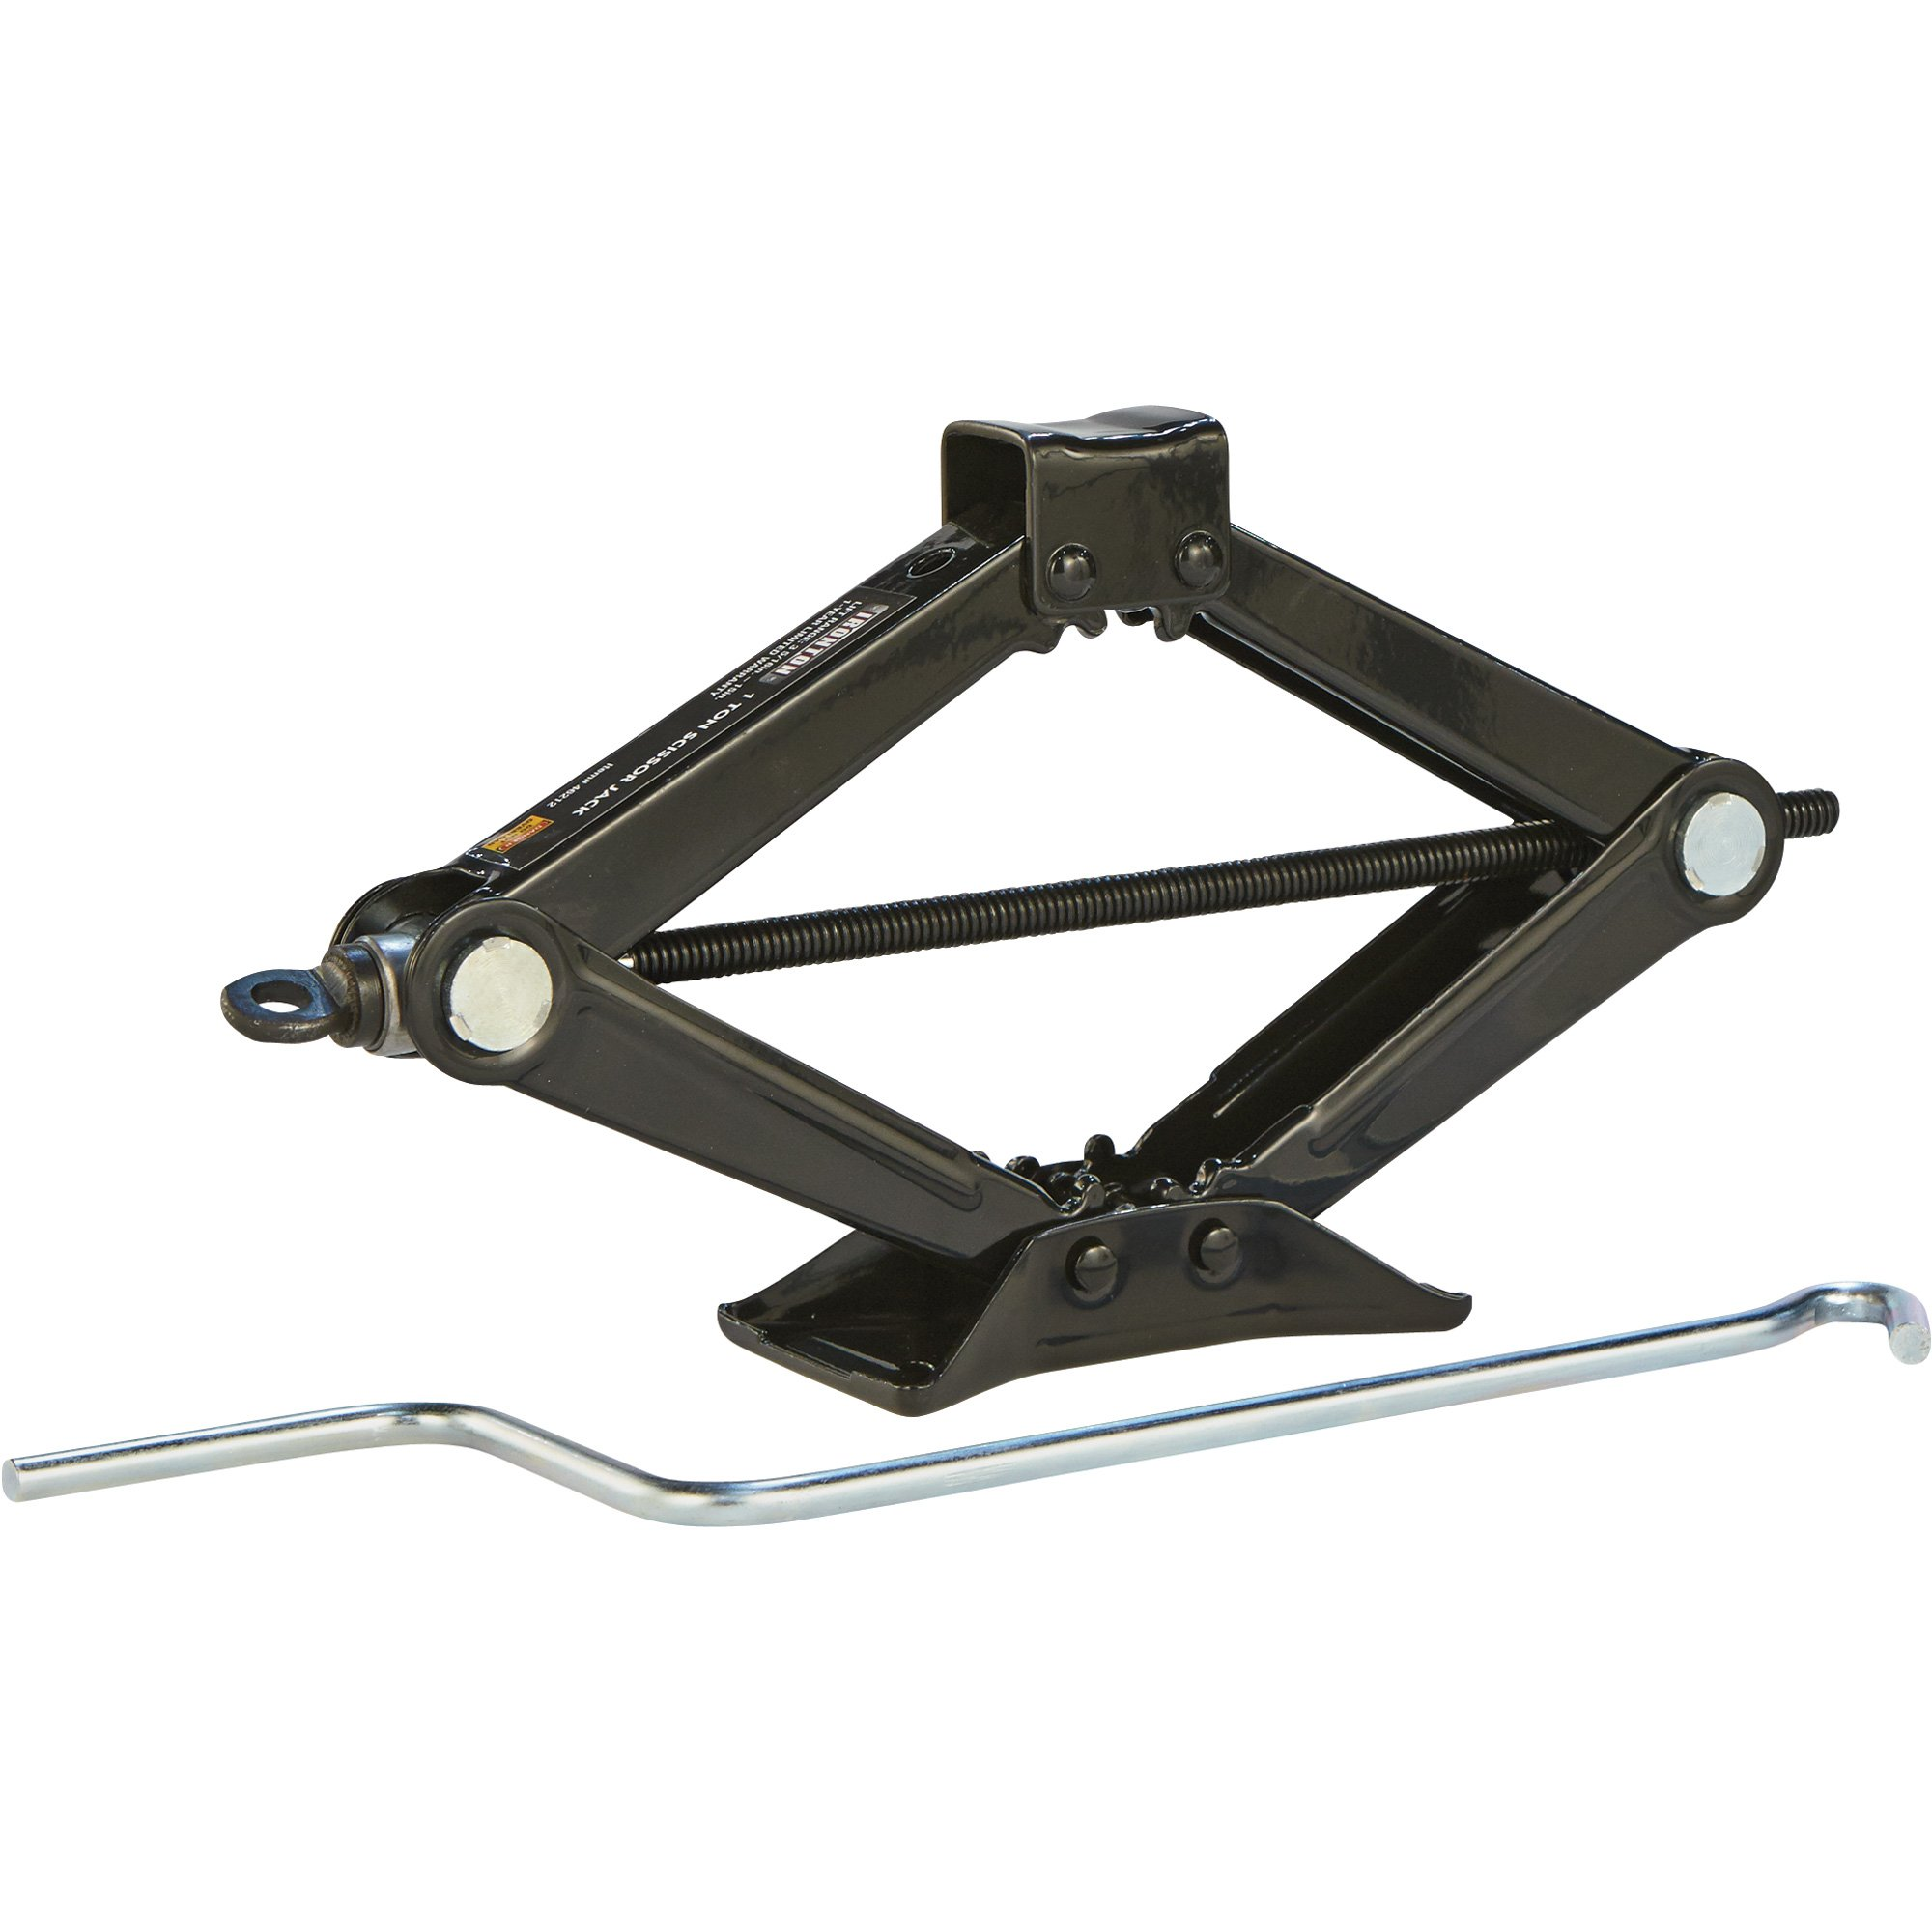 Ironton Steel Scissor Jack - 1-Ton Capacity, 3 5/16in.-15in. Lift Range